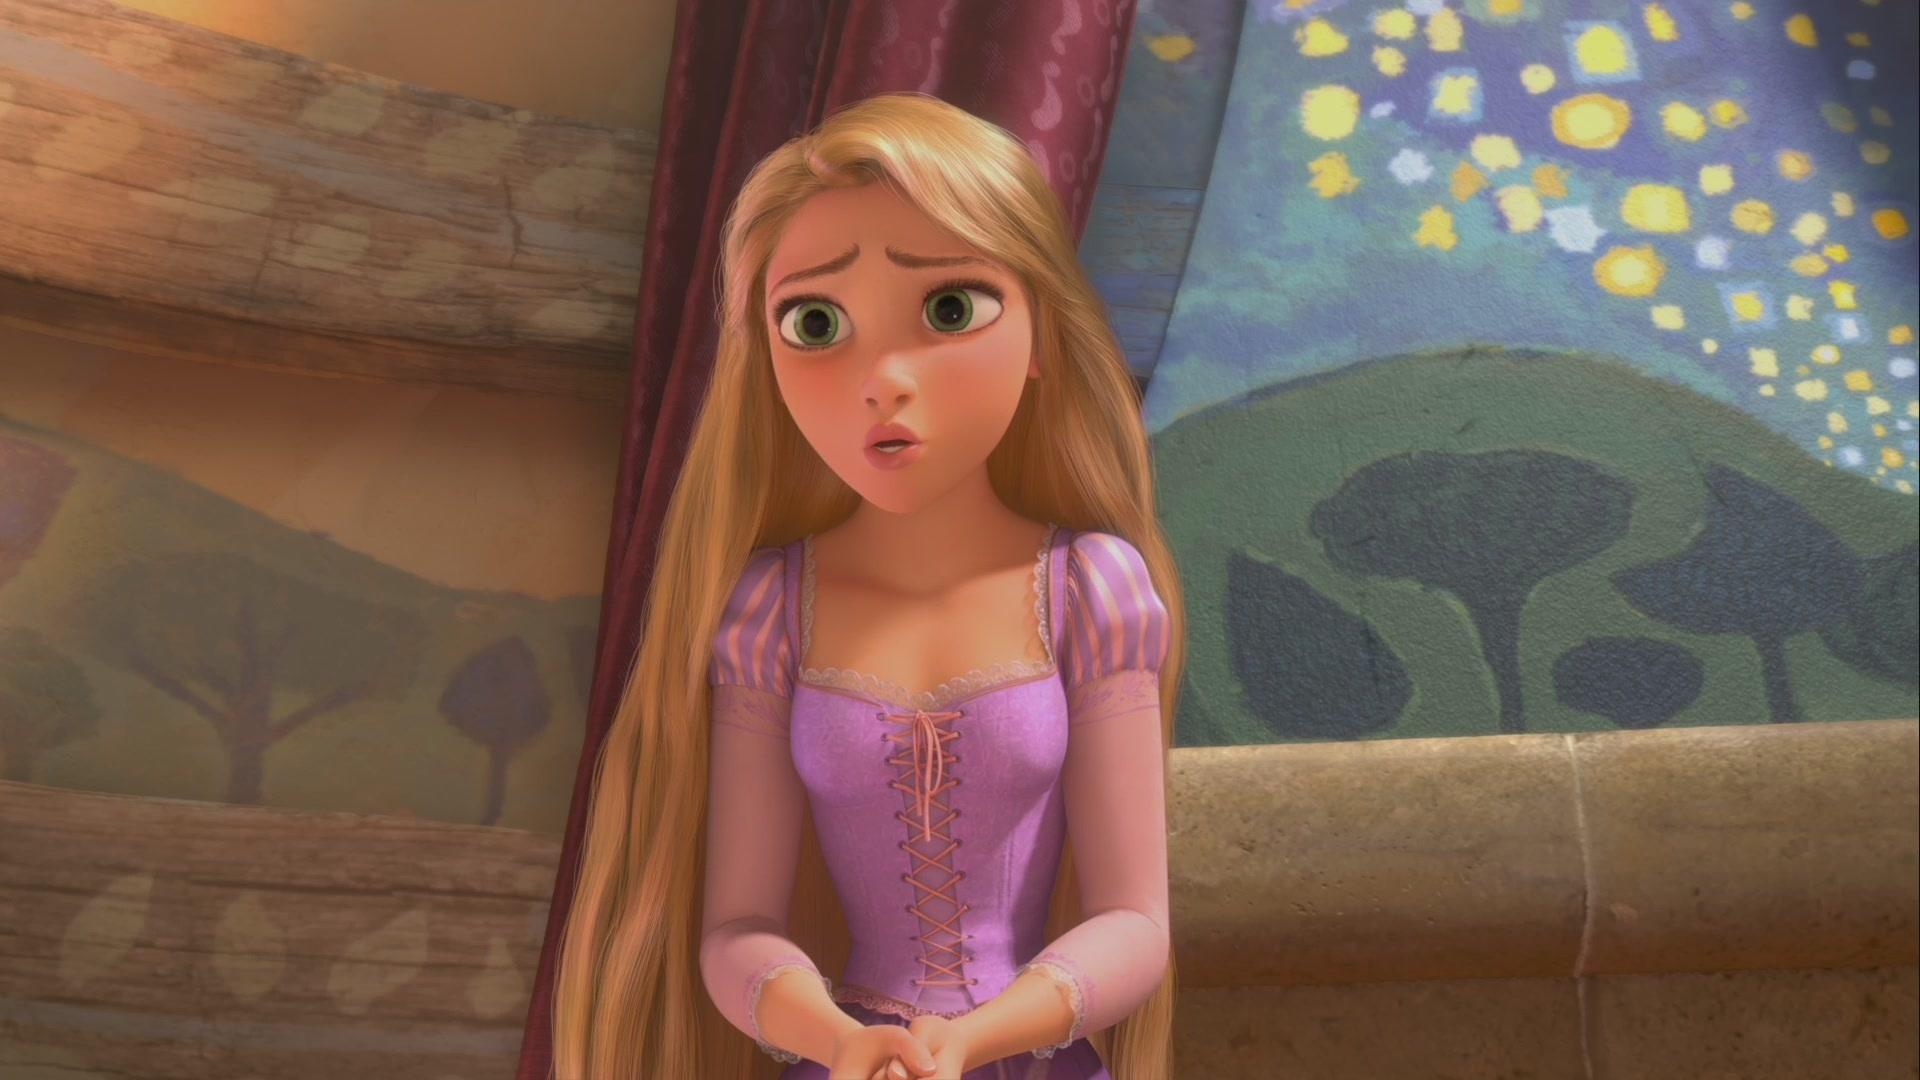 Screencaps - Tangled Image (16778930) - Fanpop Disney Rapunzel Screencaps